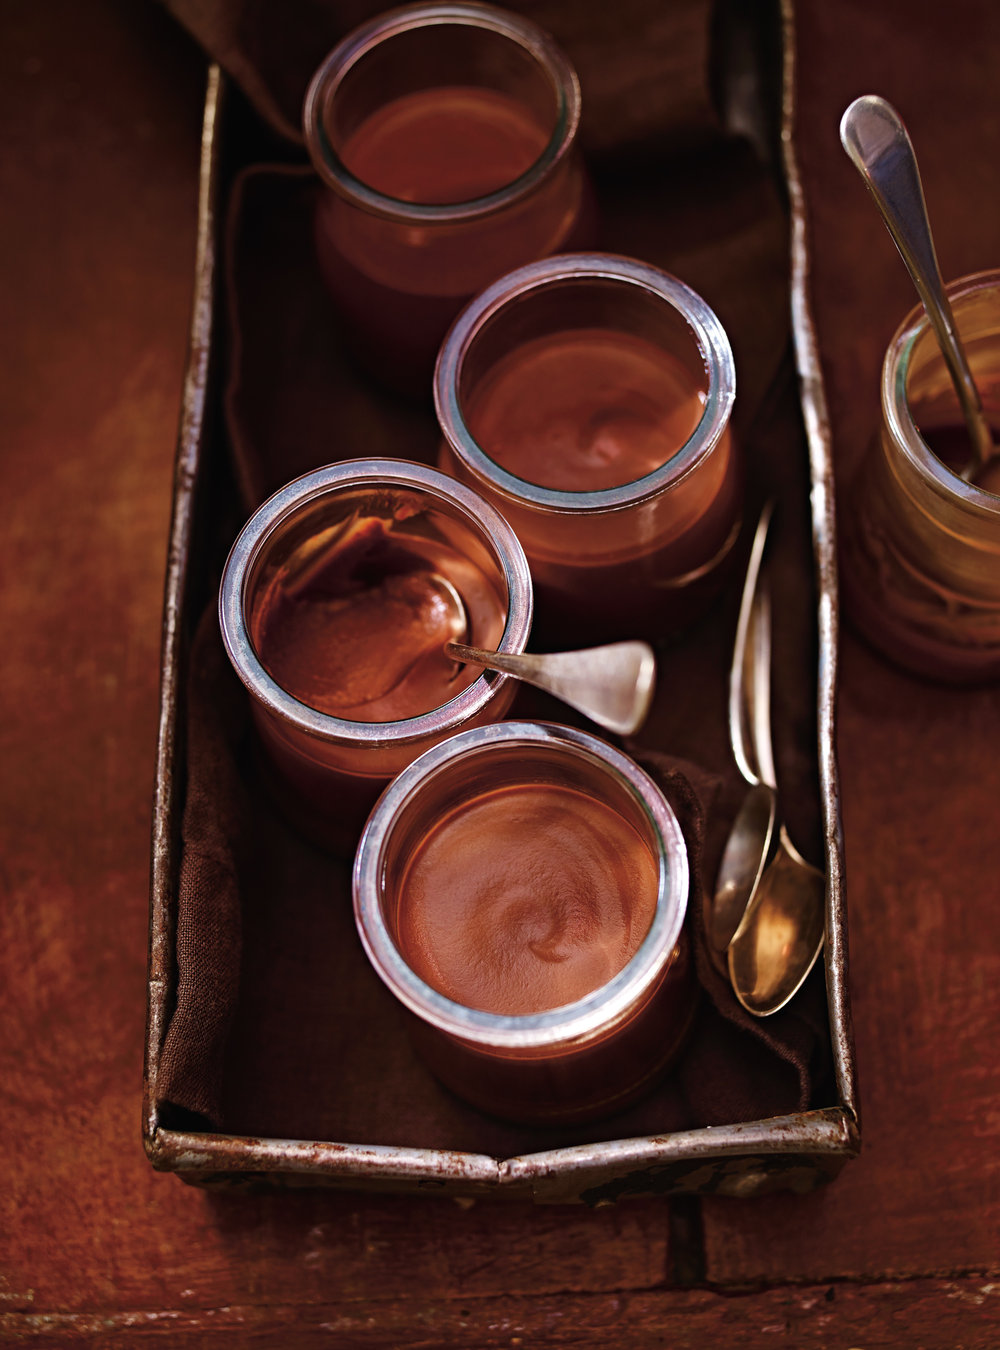 Pot de crème au chocolat | ricardo